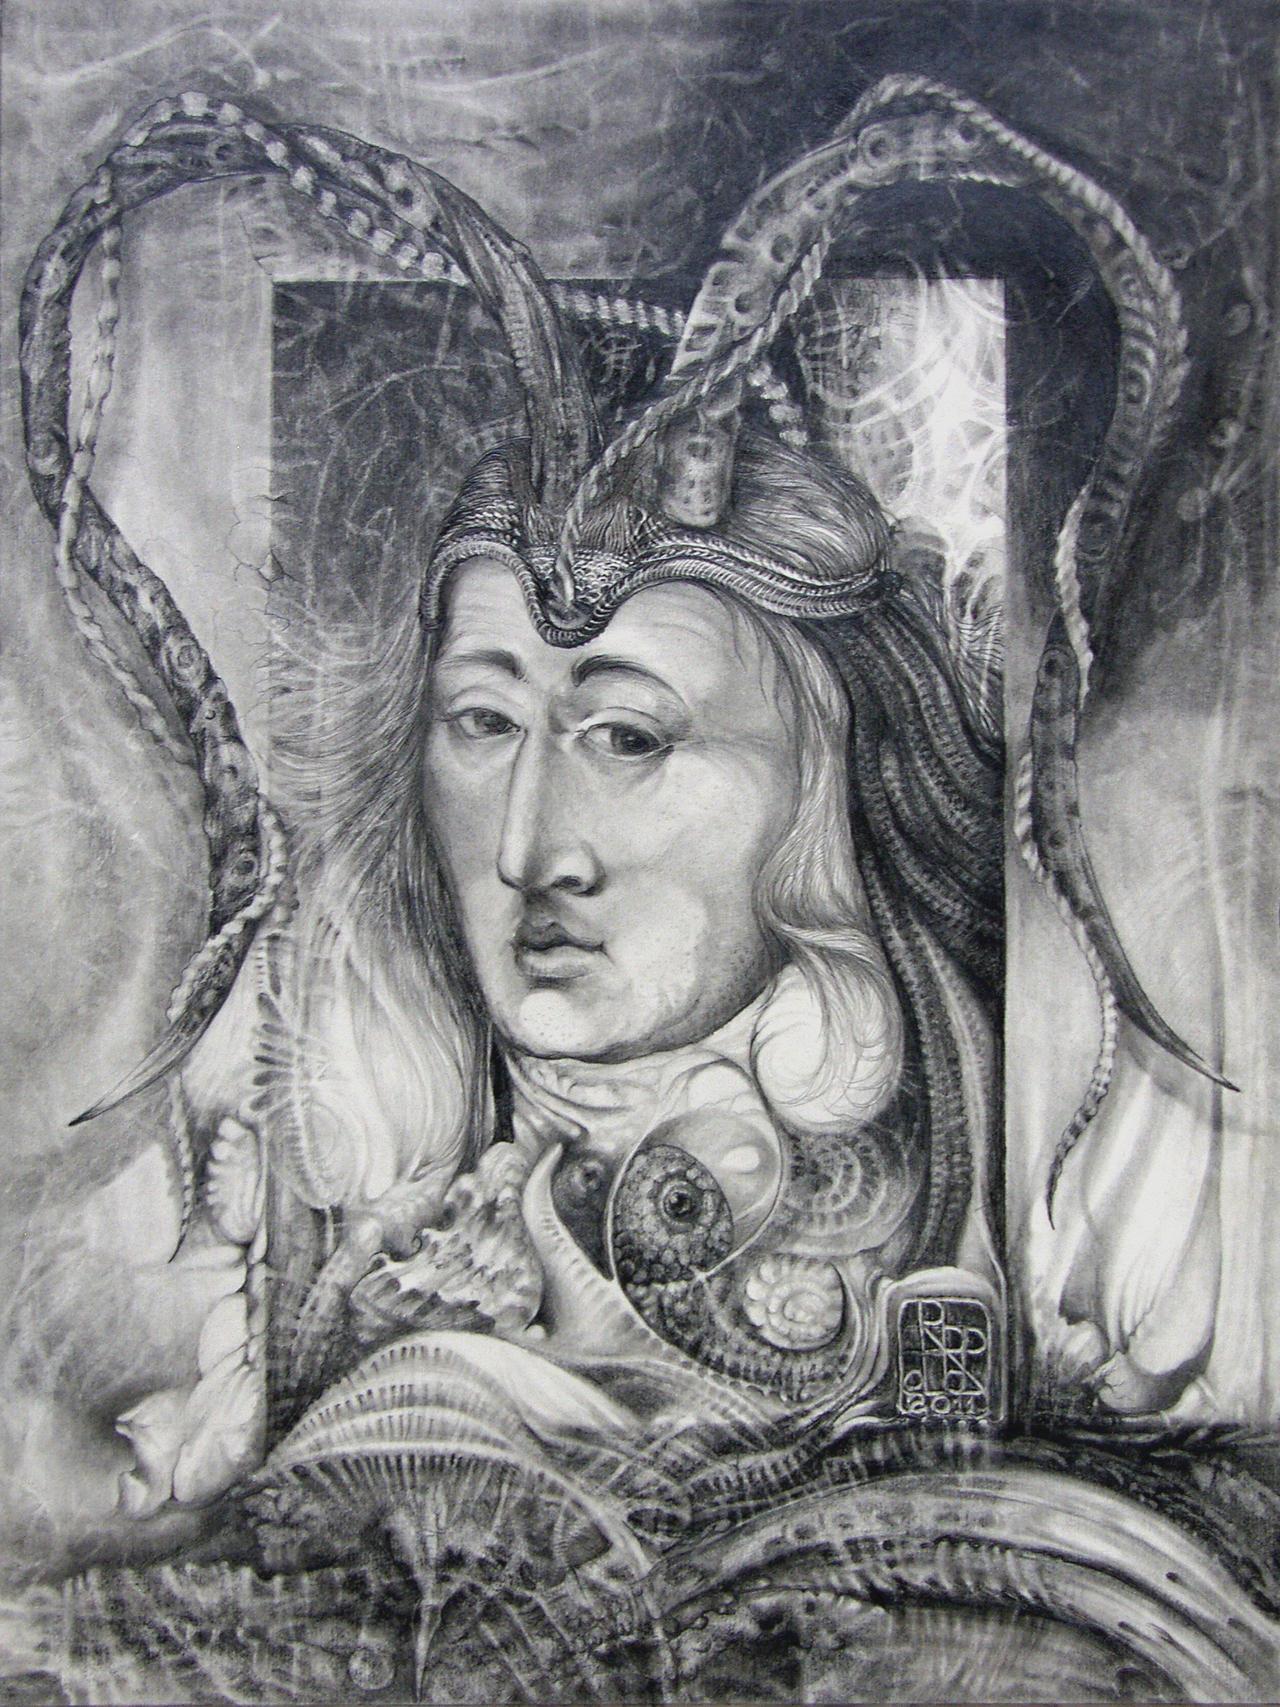 WIZARD OF BOGOMIL'S ISLAND - THE FOMORII CONJURER